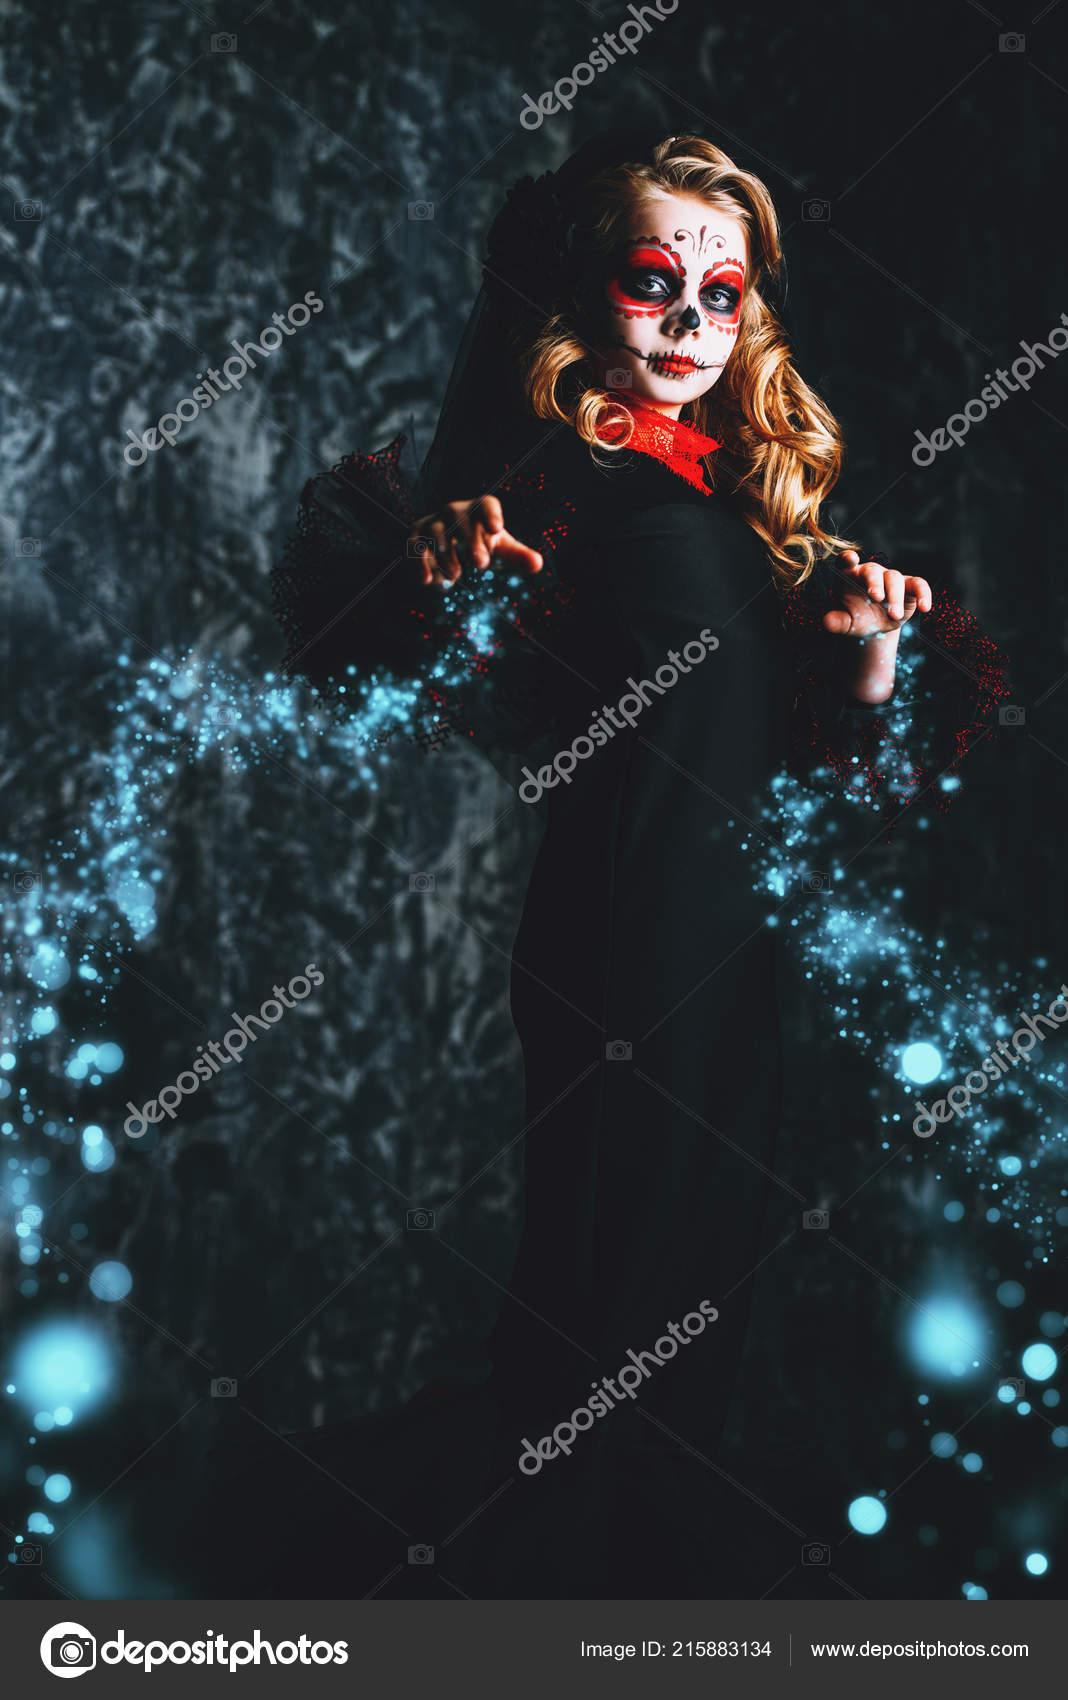 Sugar Skull Costume Adult Day of The Dead Catrina Dia de Los Muertos Halloween